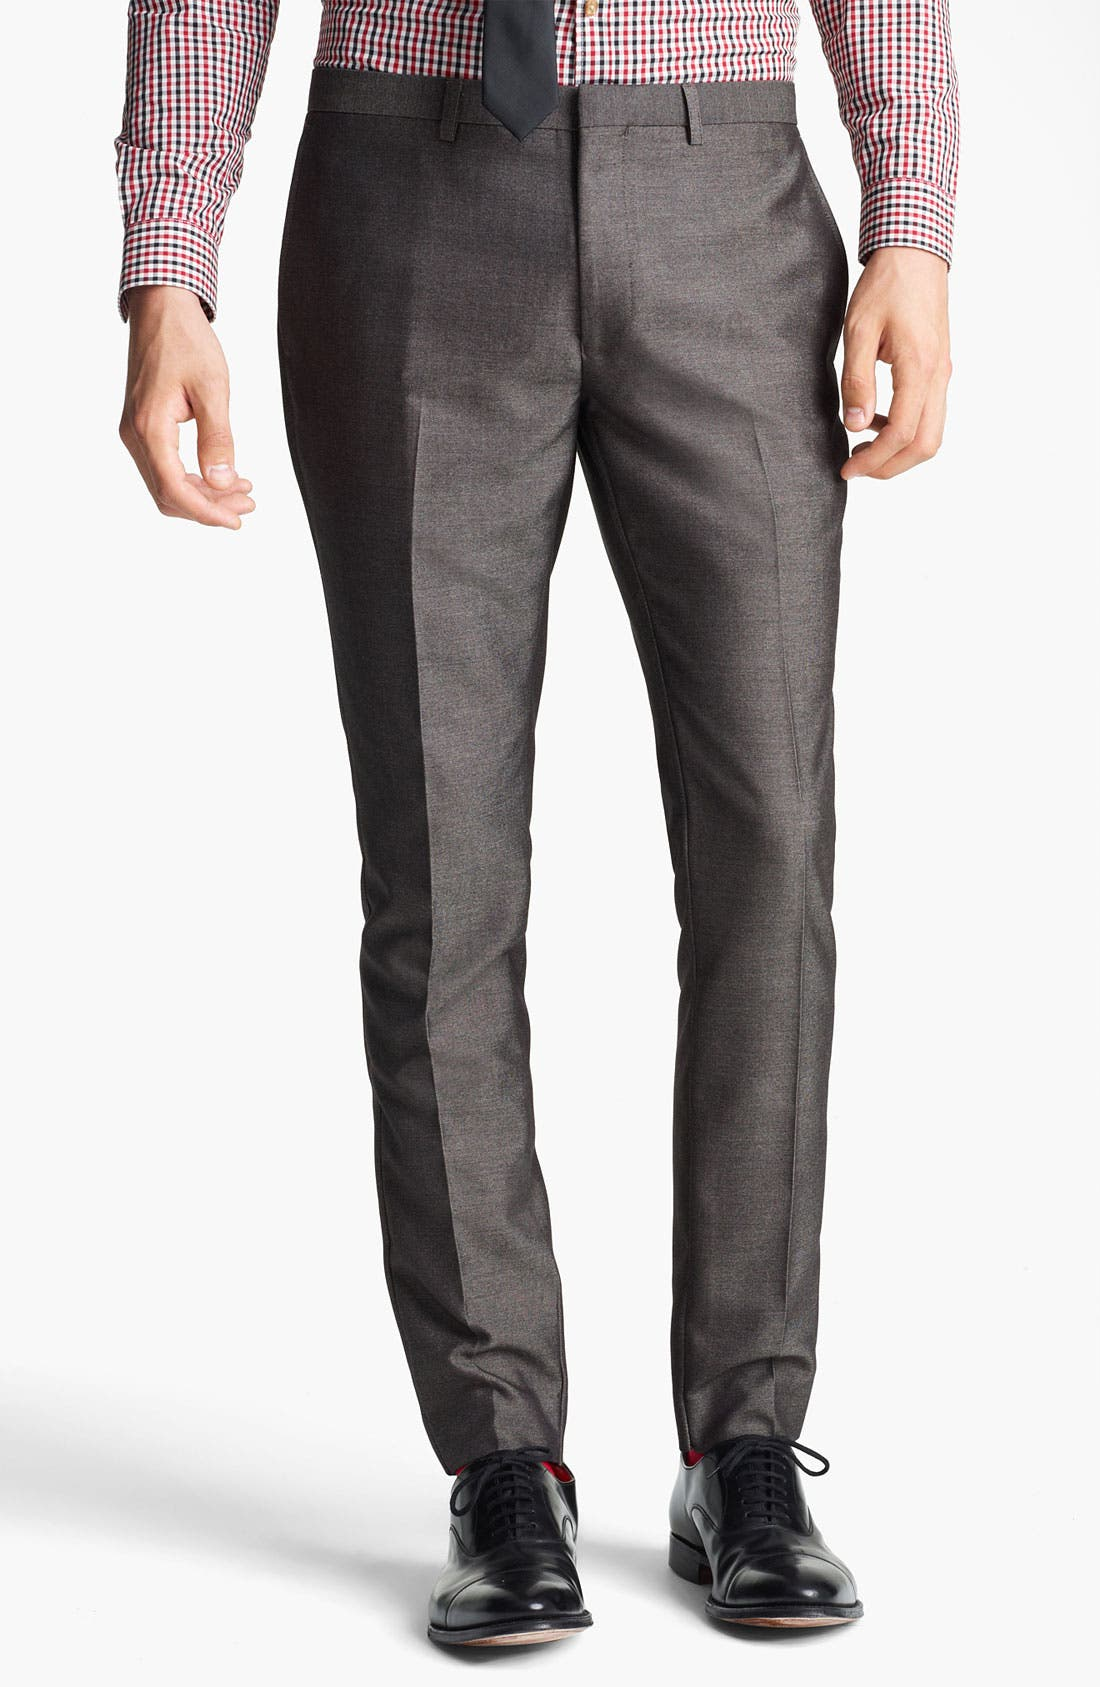 Alternate Image 1 Selected - Topman 'Taylor' Skinny Trousers